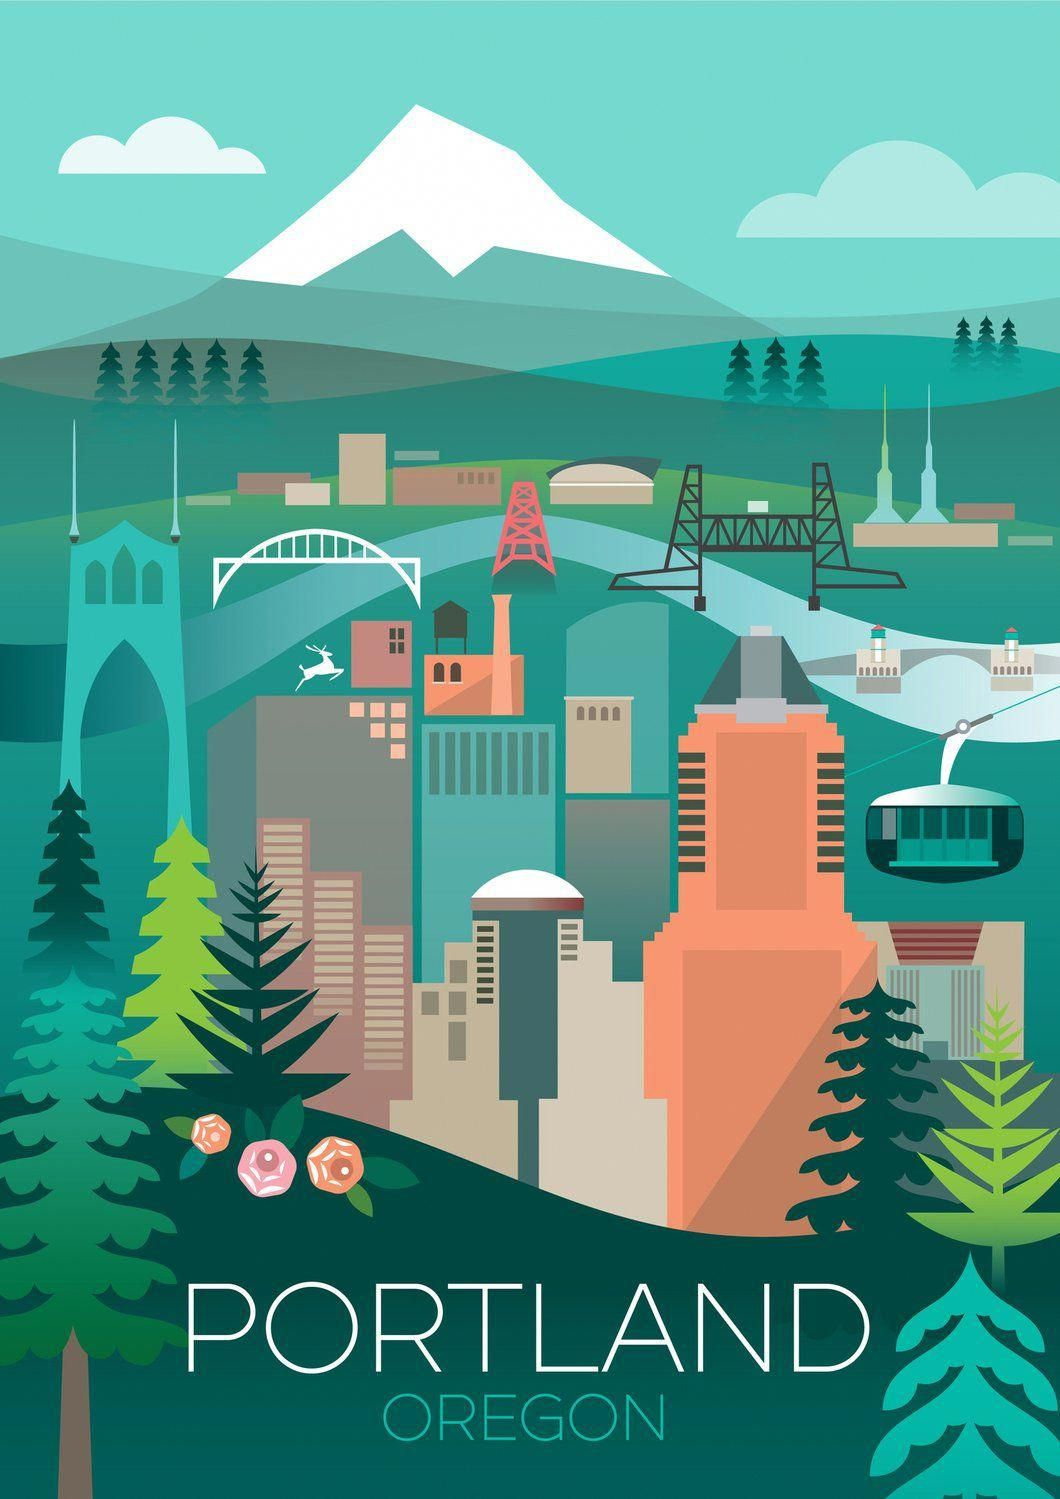 Usedtraveltrailerstexas Traveldestinationsusamontana Oregon Travel Travel Posters Travel Usa